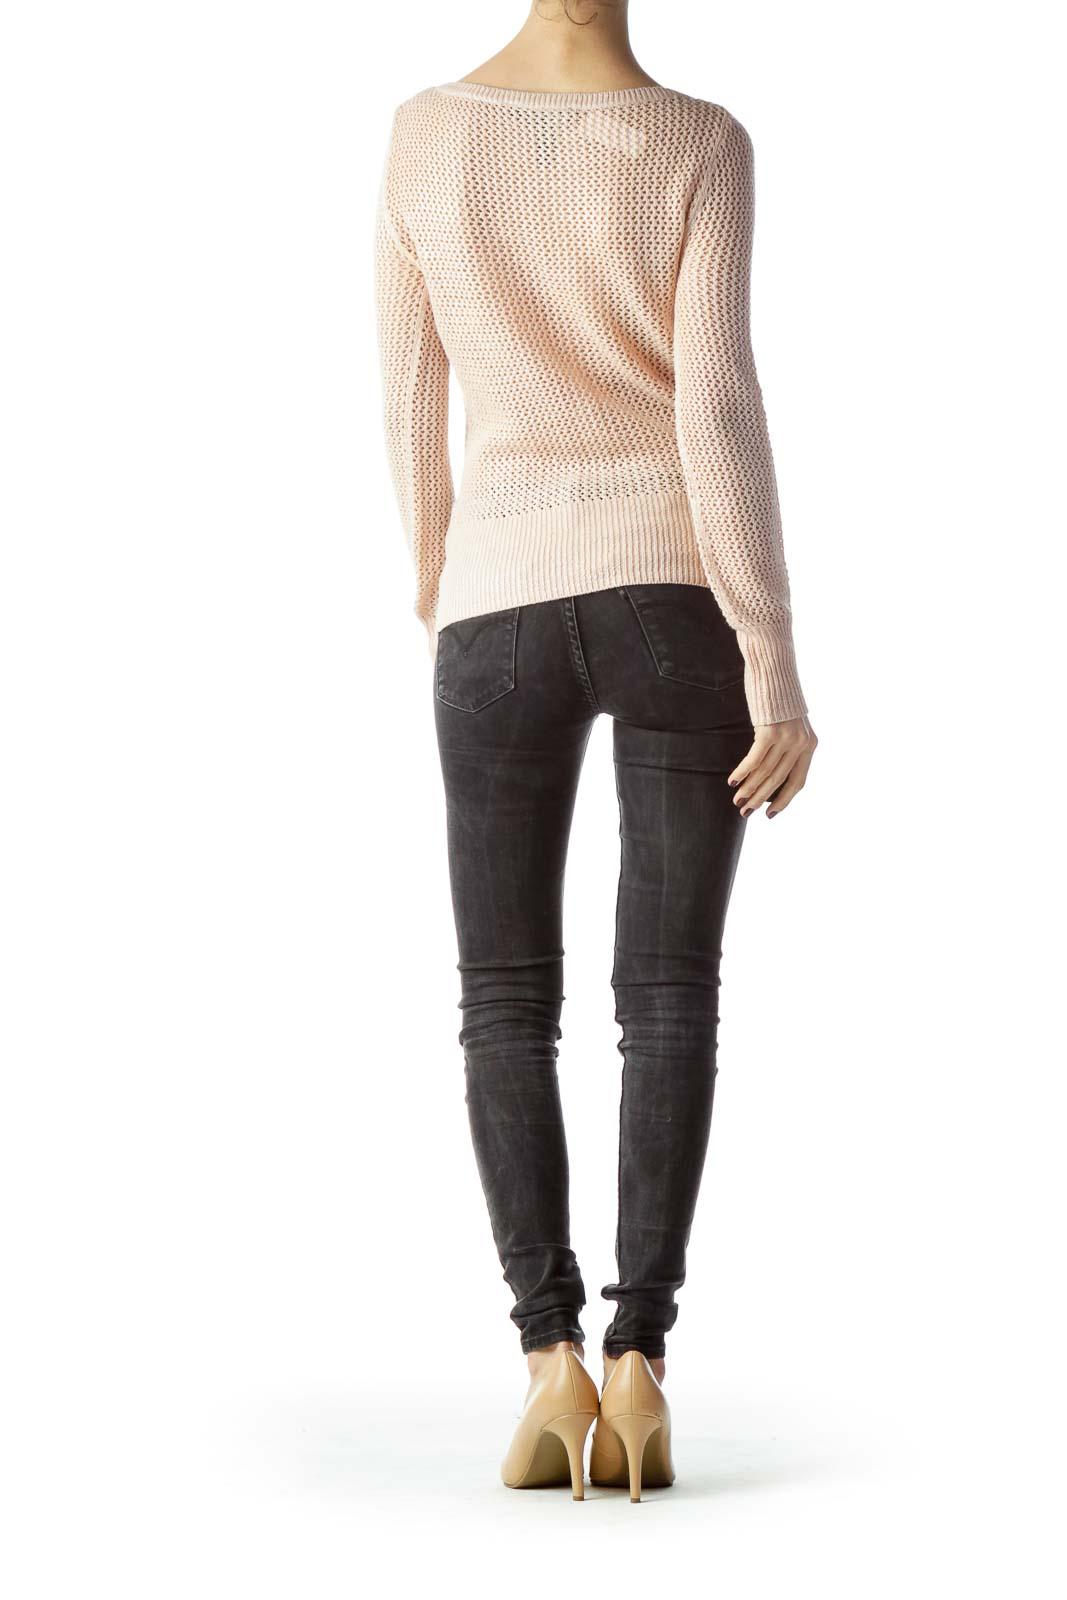 Salmon Pink Metallic Knitted Top